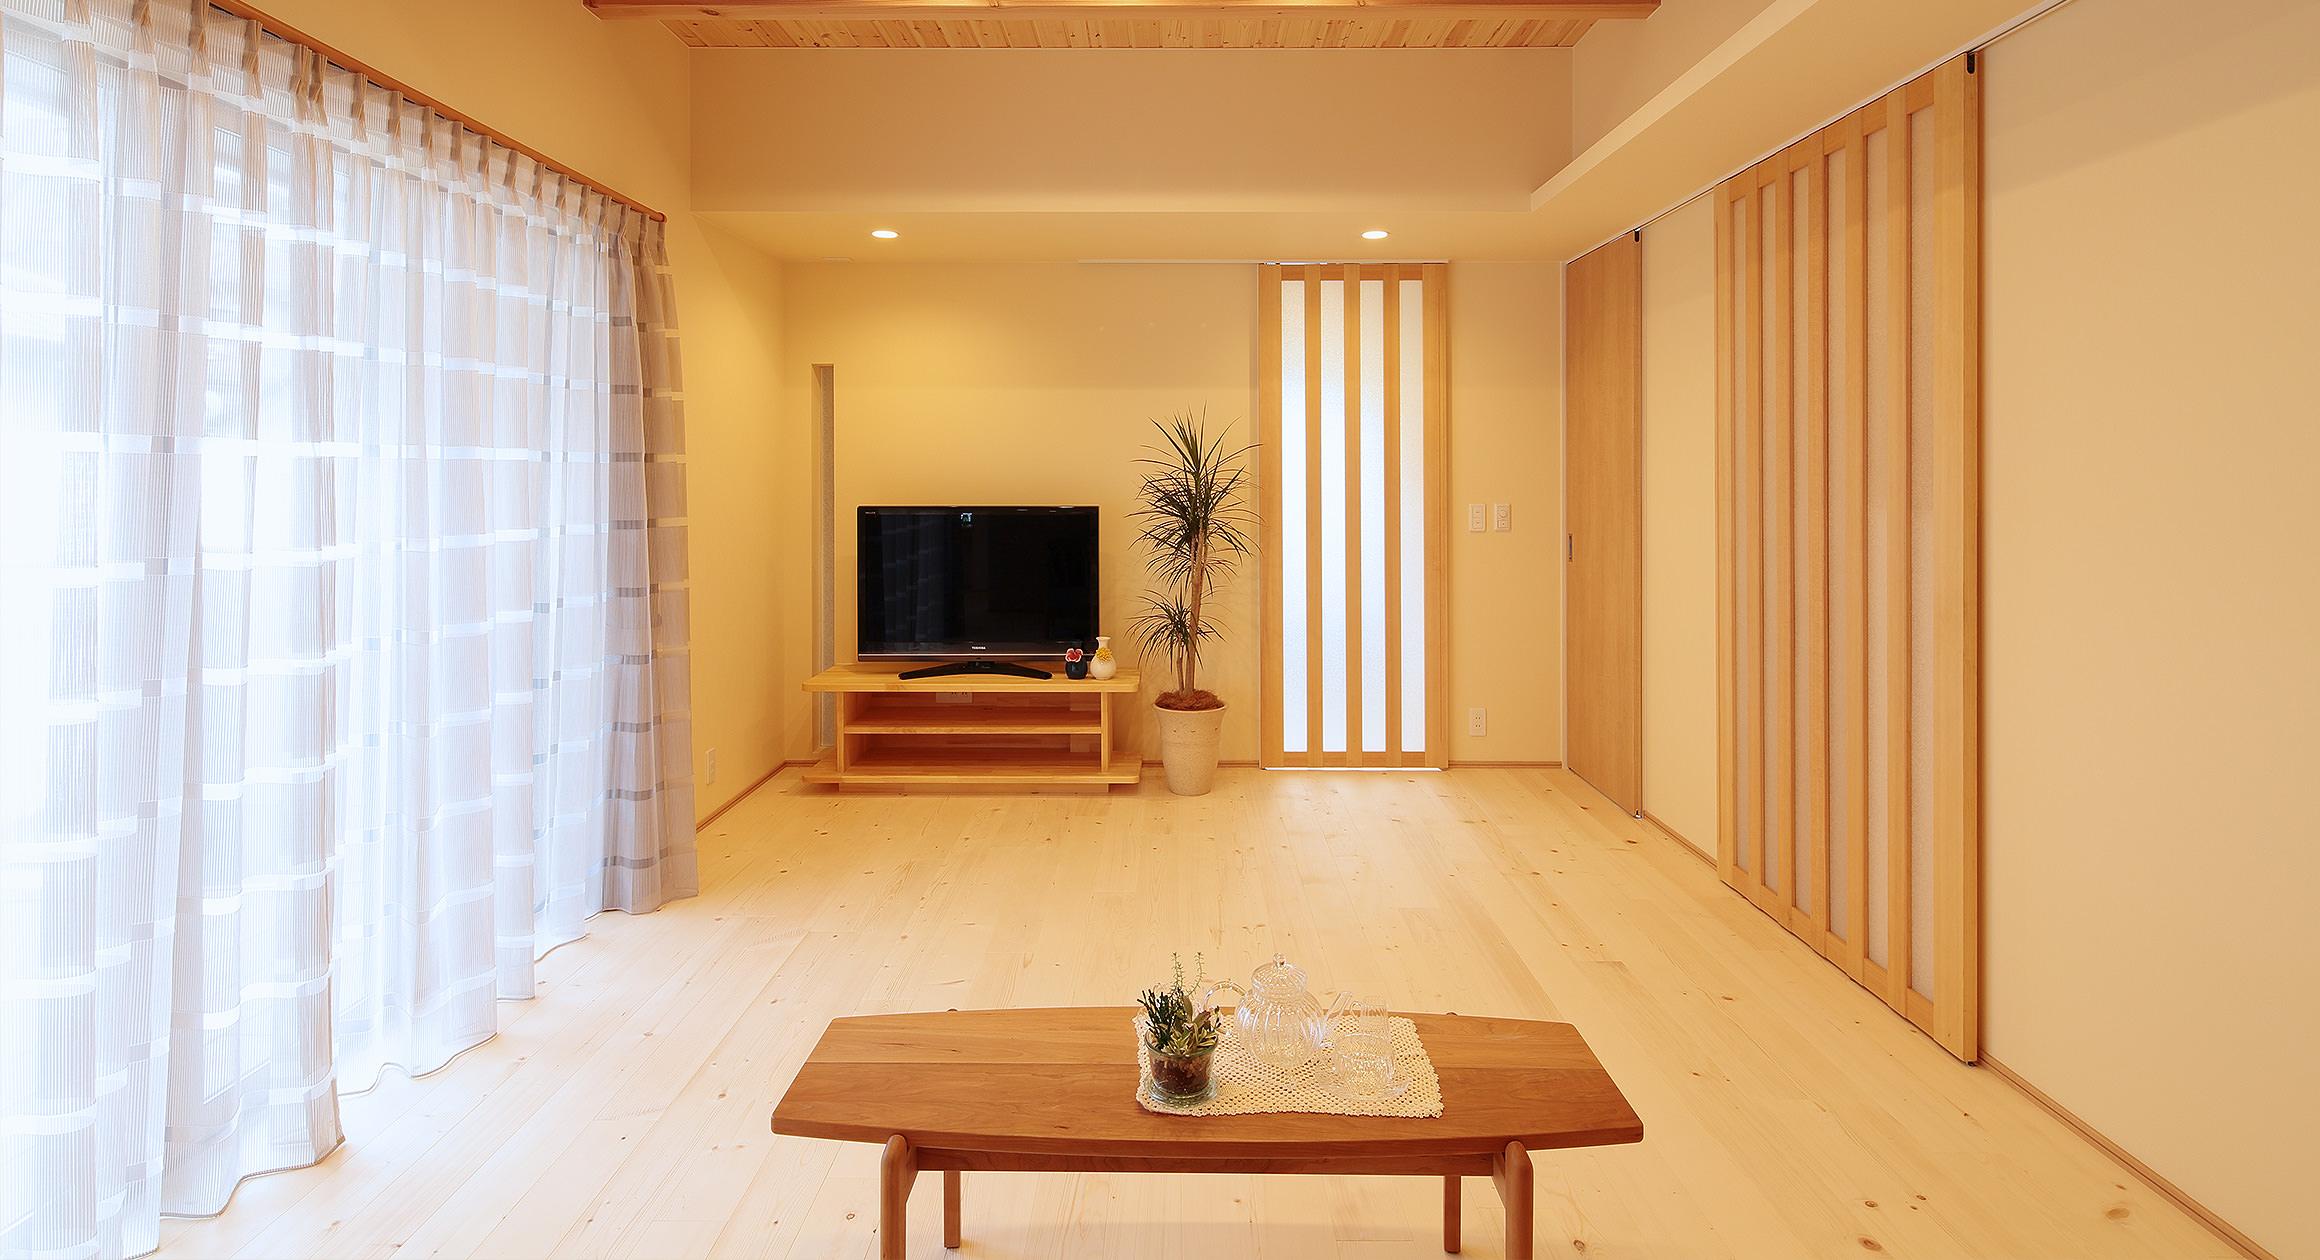 三友工務店の新築注文住宅 熊本市O様邸